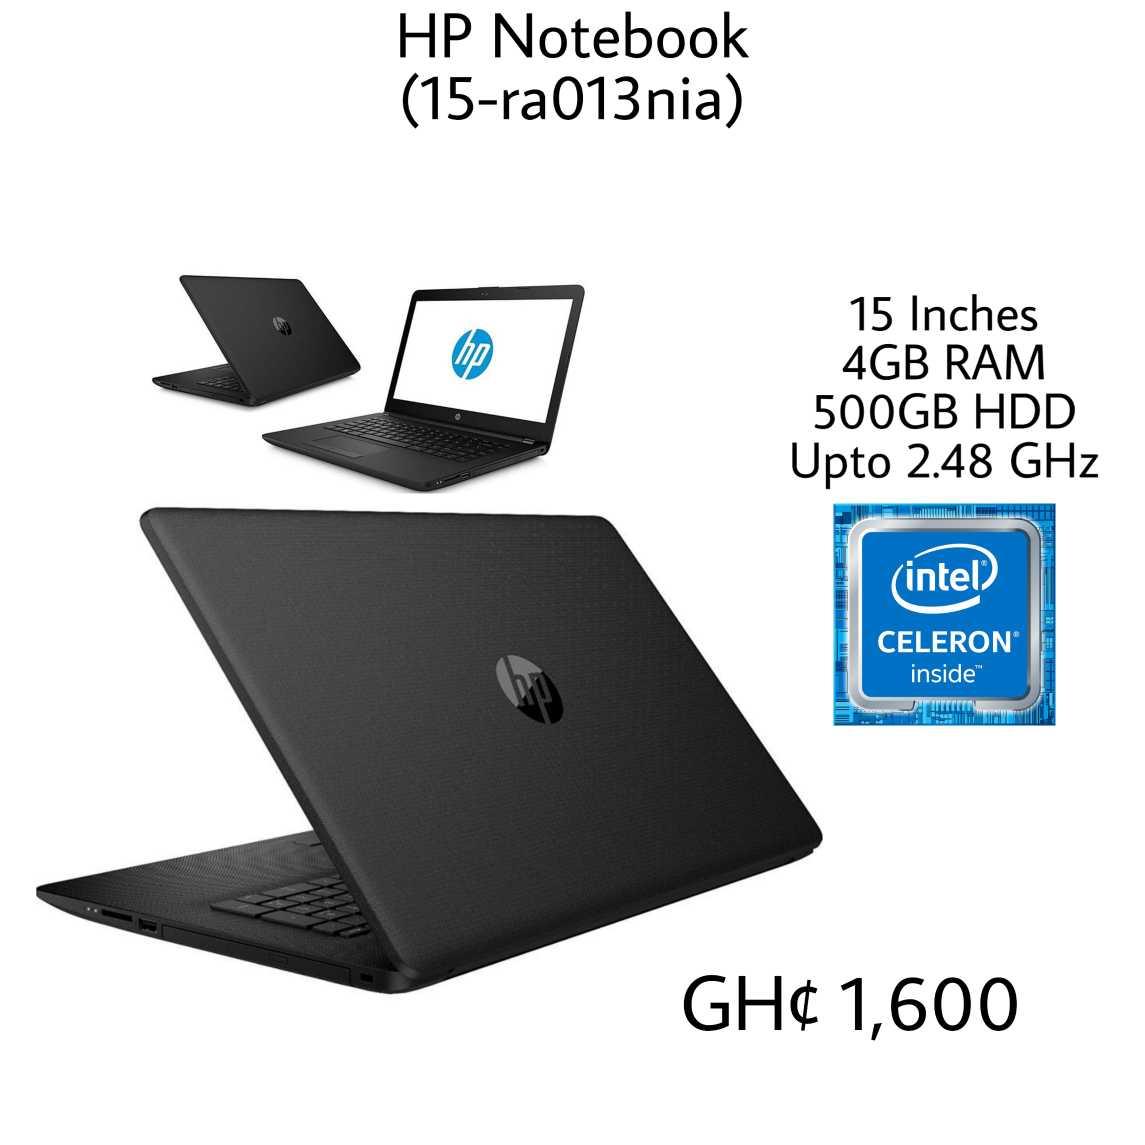 price of hp notebook 500gb in ghana